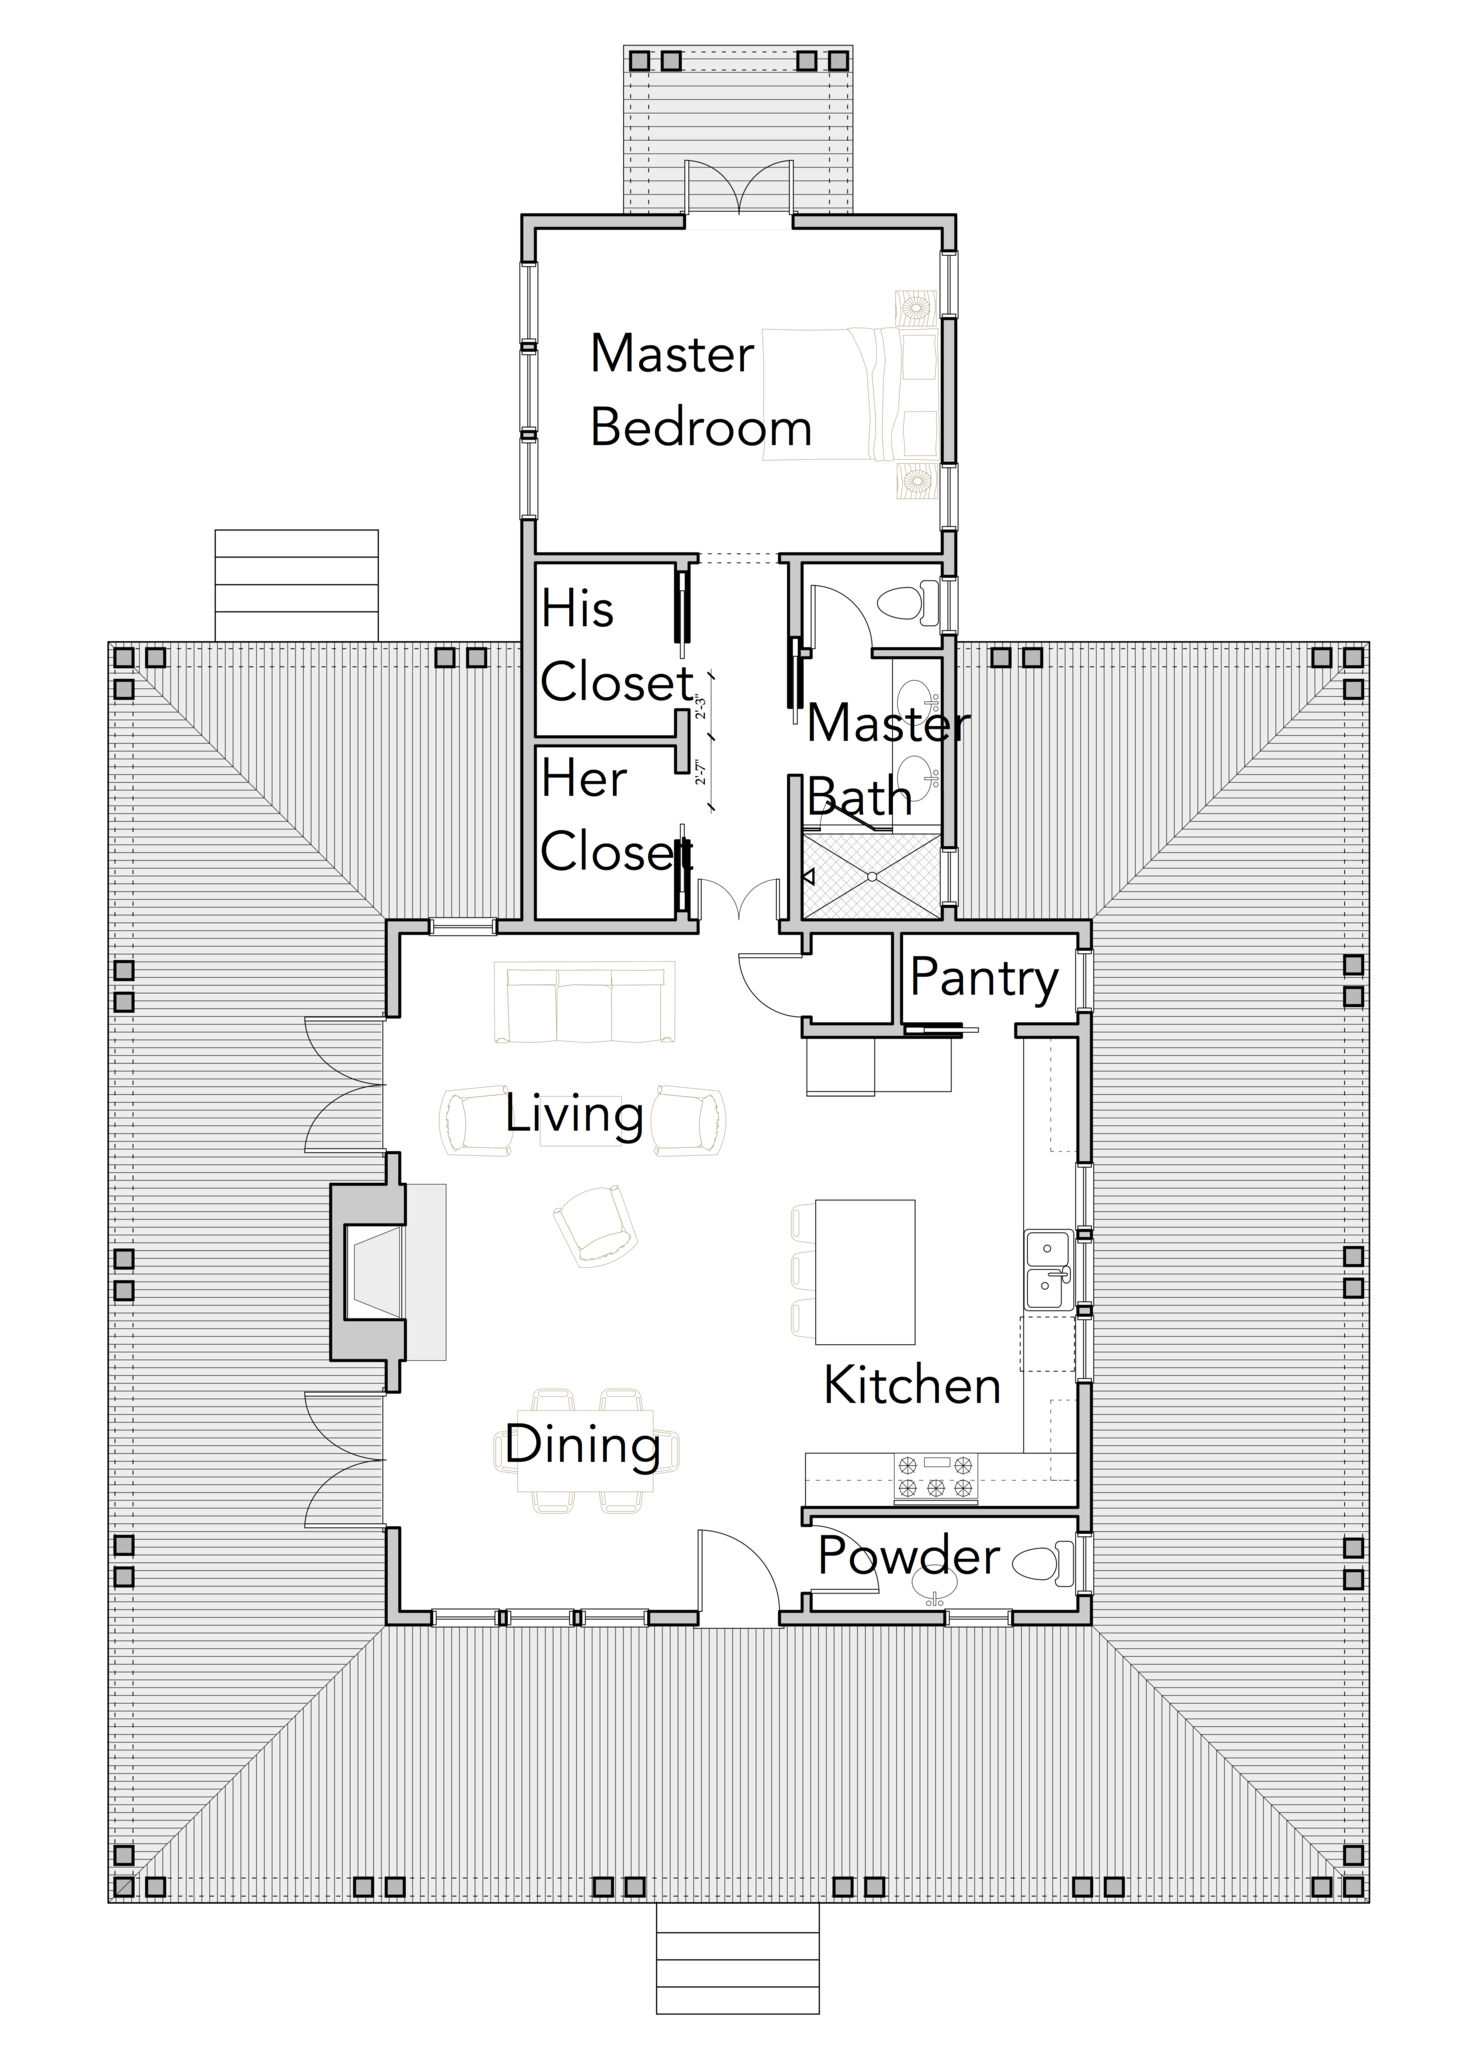 Standard House Plan Collection Engineering Discoveries Unique House Plans Bungalow Floor Plans Budget House Plans